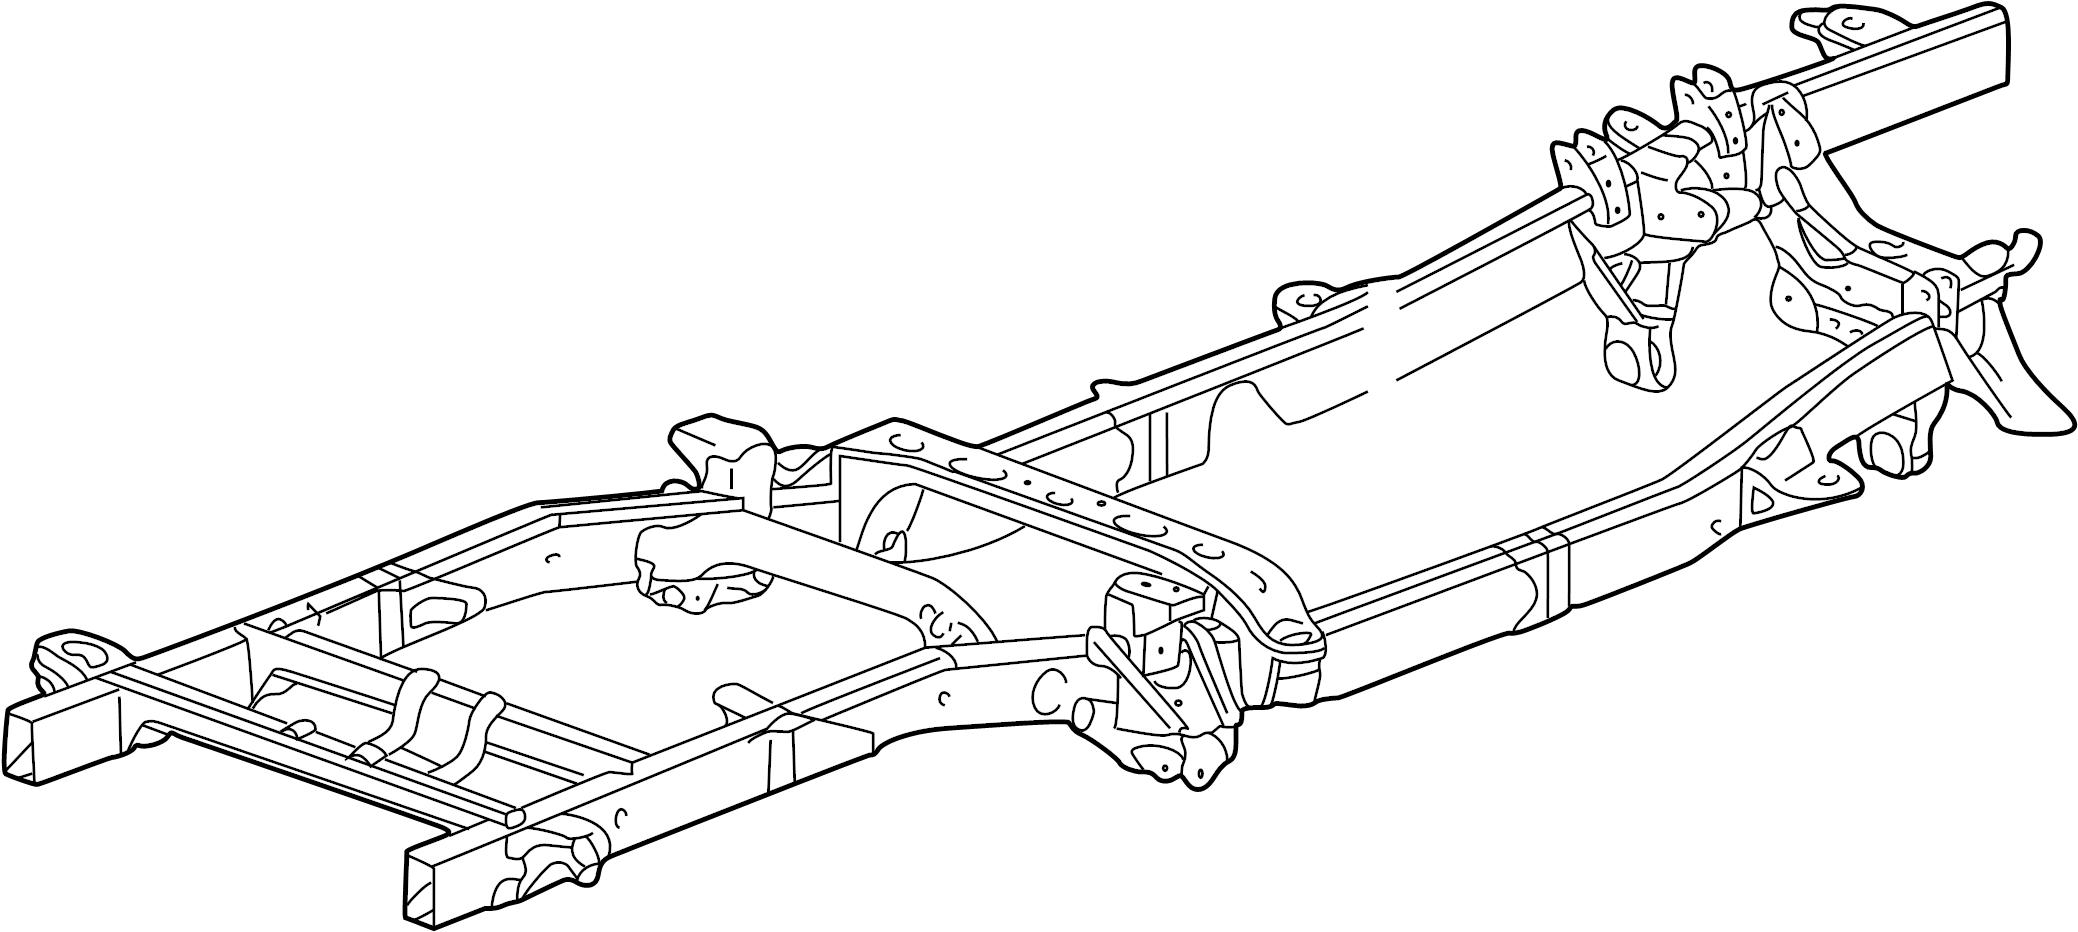 Dodge Ram 2500 Frame Rail. 2003-05, FRAME & CROSSMEMBERS